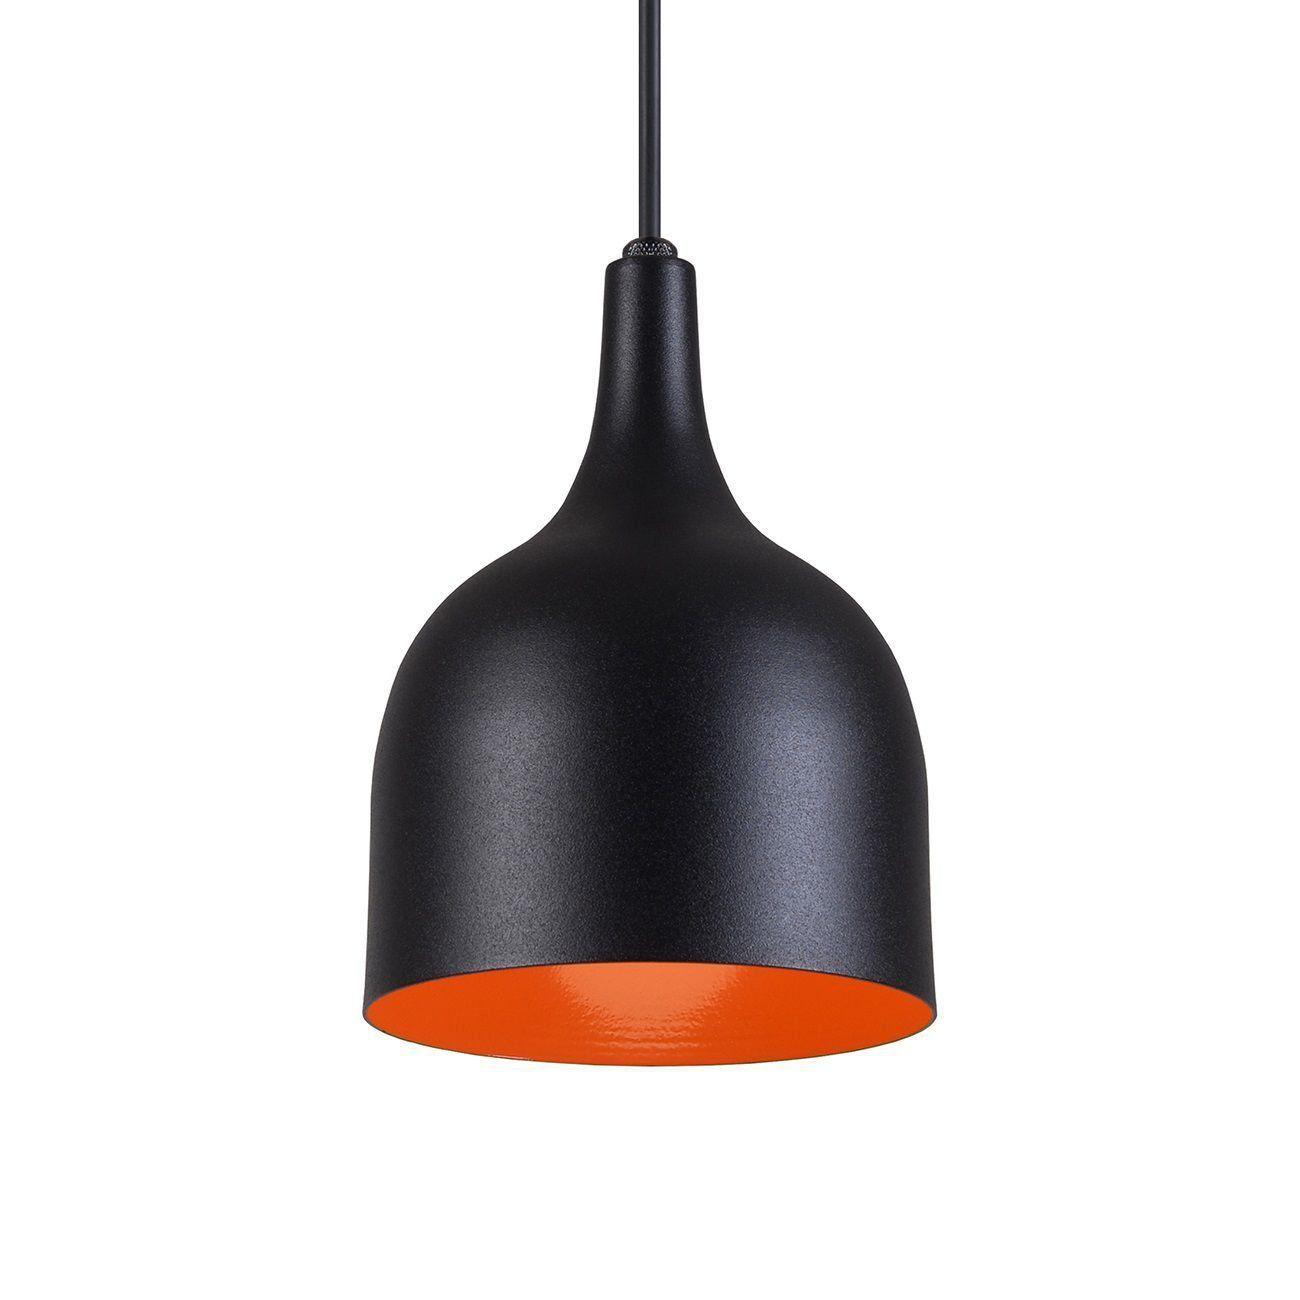 Pendente Gota Teat Luminária Lustre Alumínio Preto Textura C/ Laranja - Rei Da Iluminação